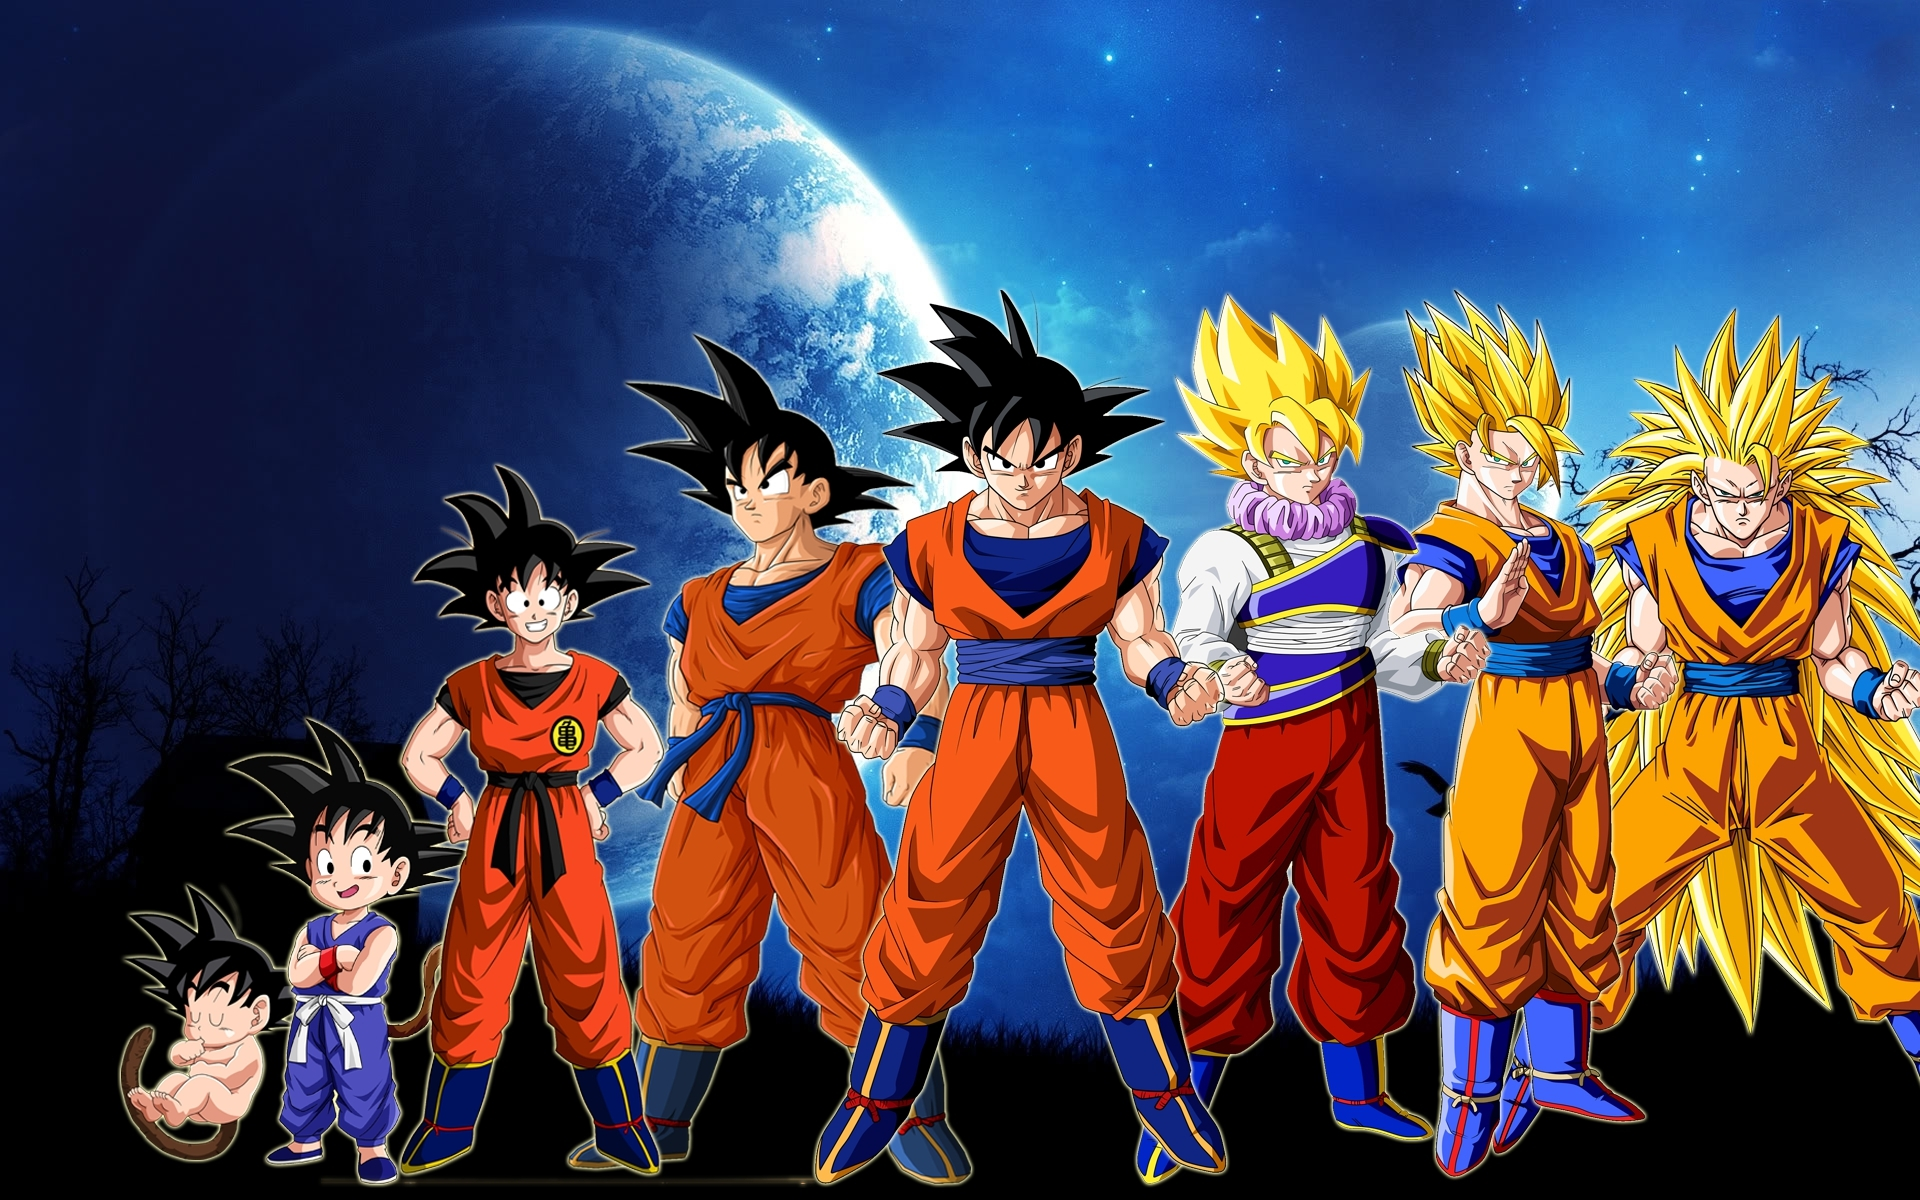 Super Saiyan Goku Wallpaper - WallpaperSafari